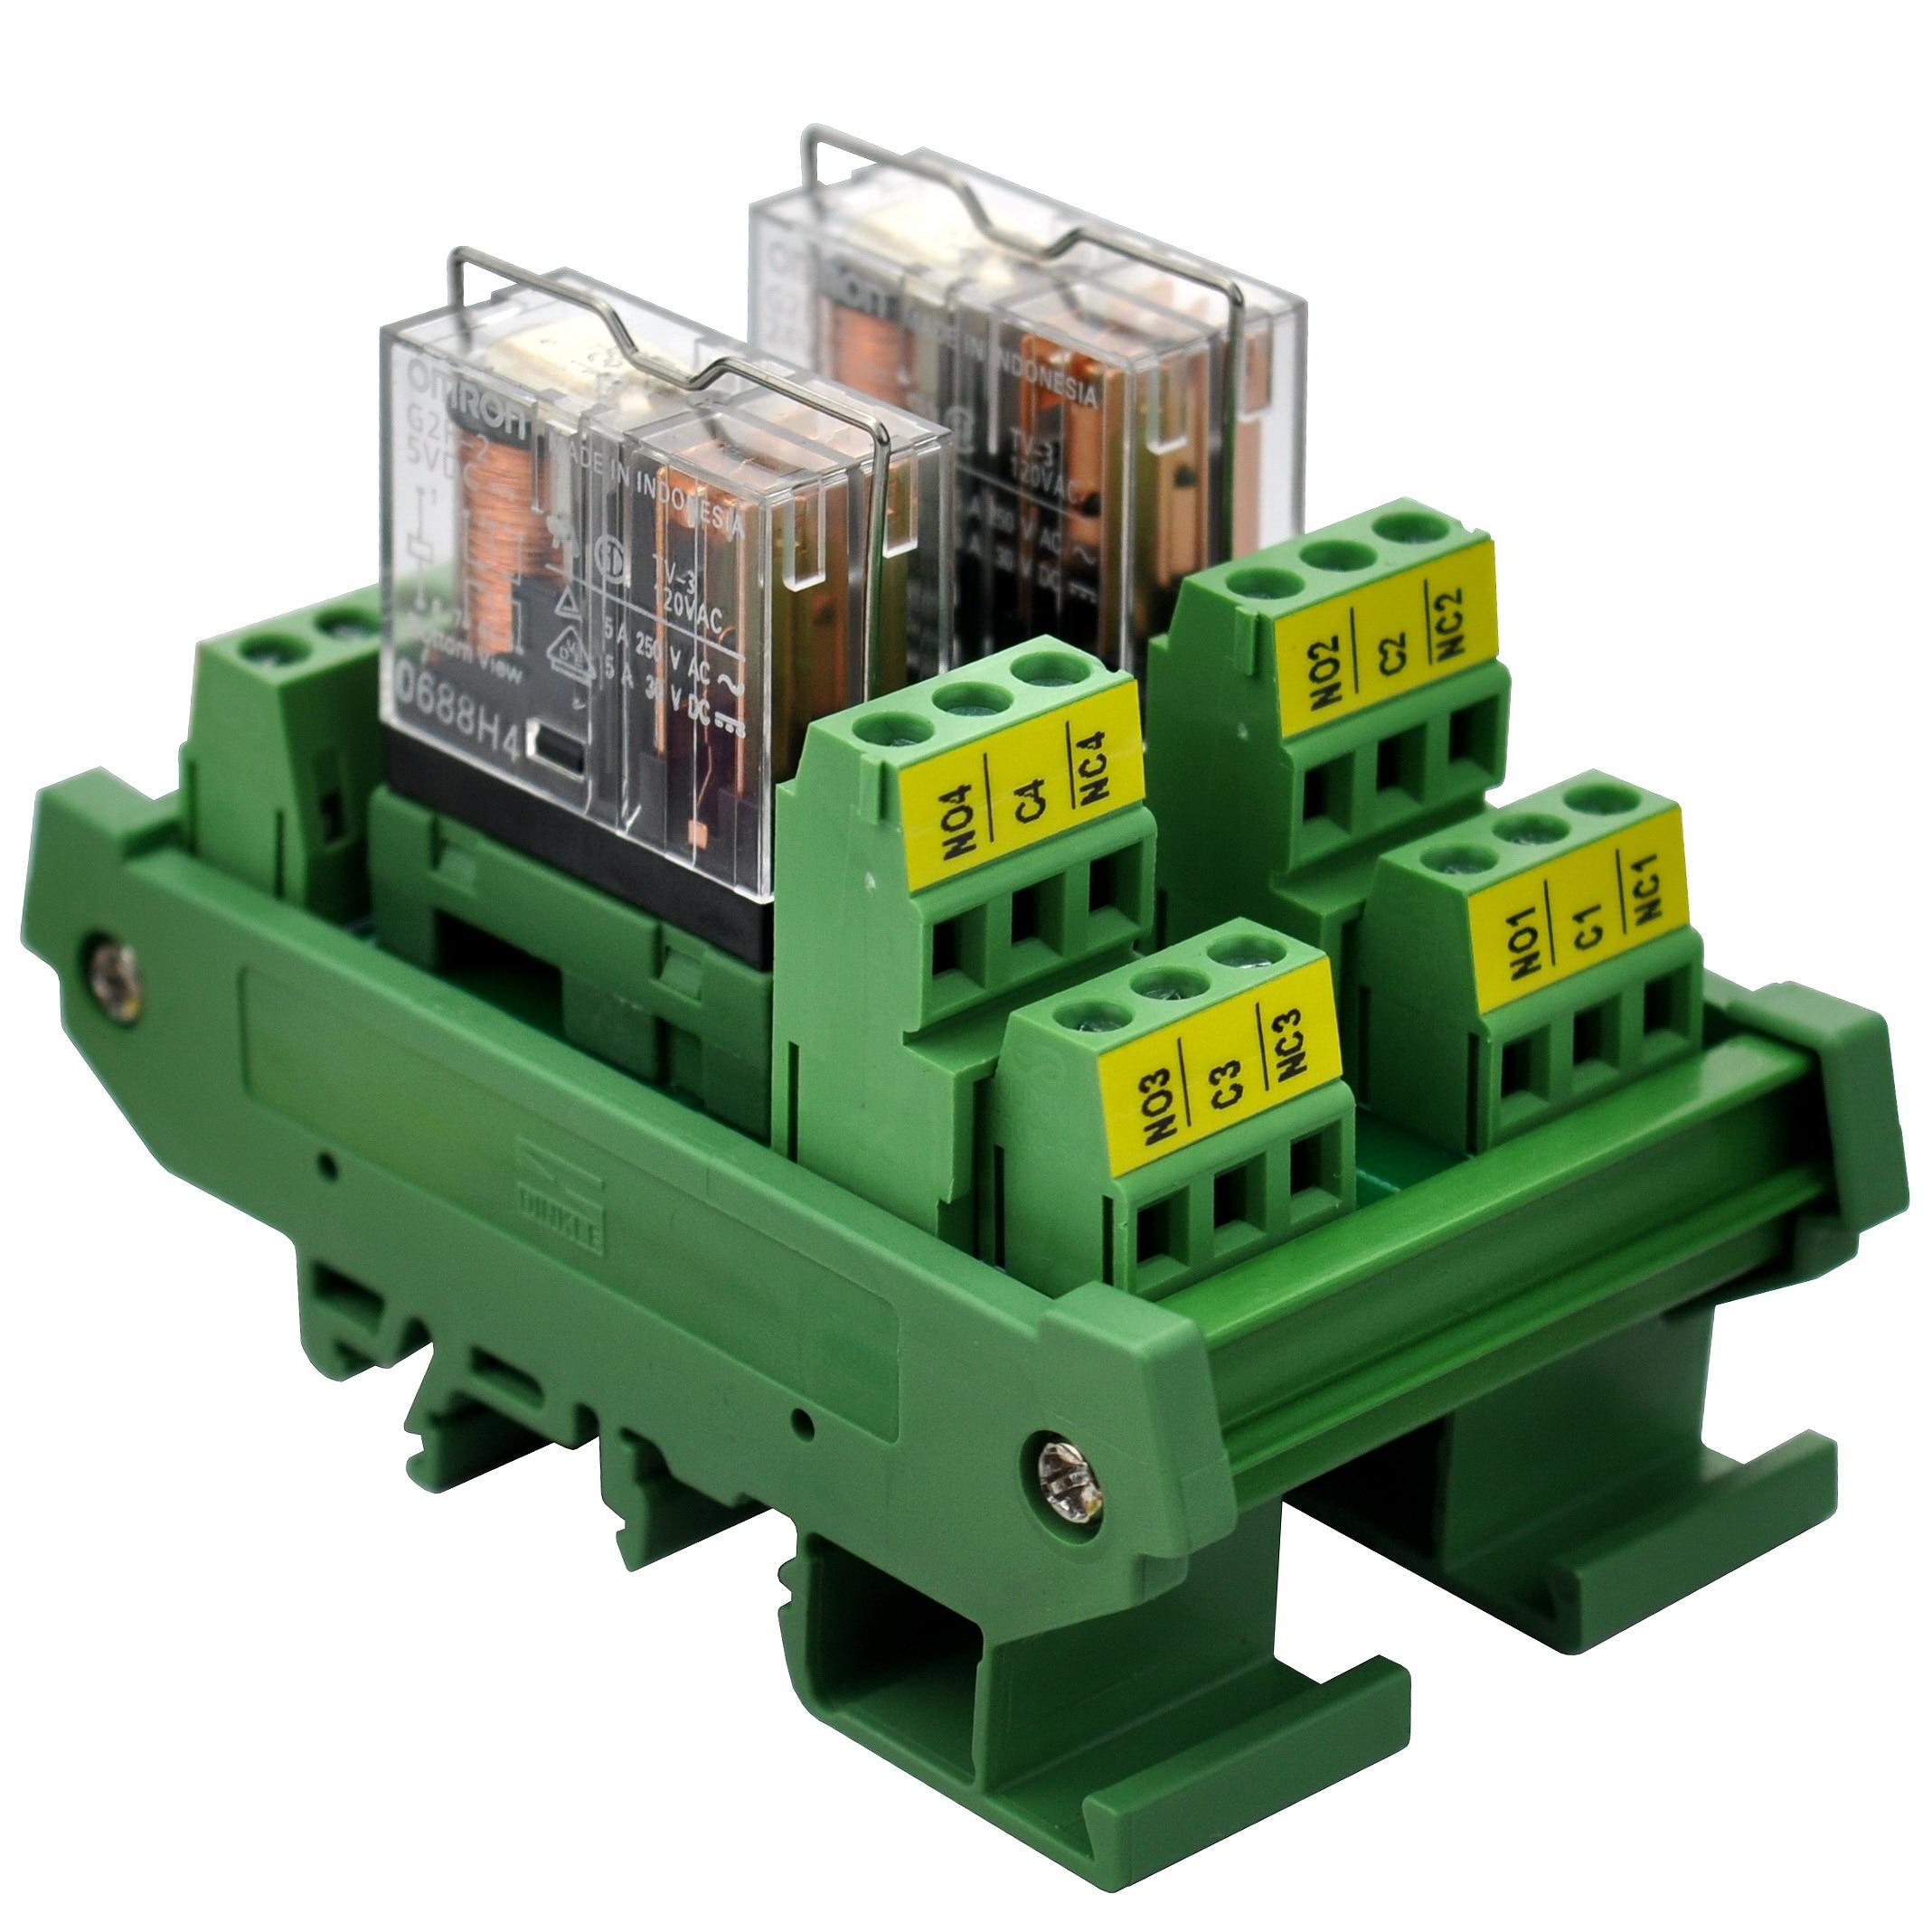 ELECTRONICS-SALON DIN Rail Mount AC/DC 5V Control 2 DPDT 5Amp Pluggable Power Relay Interface Module.